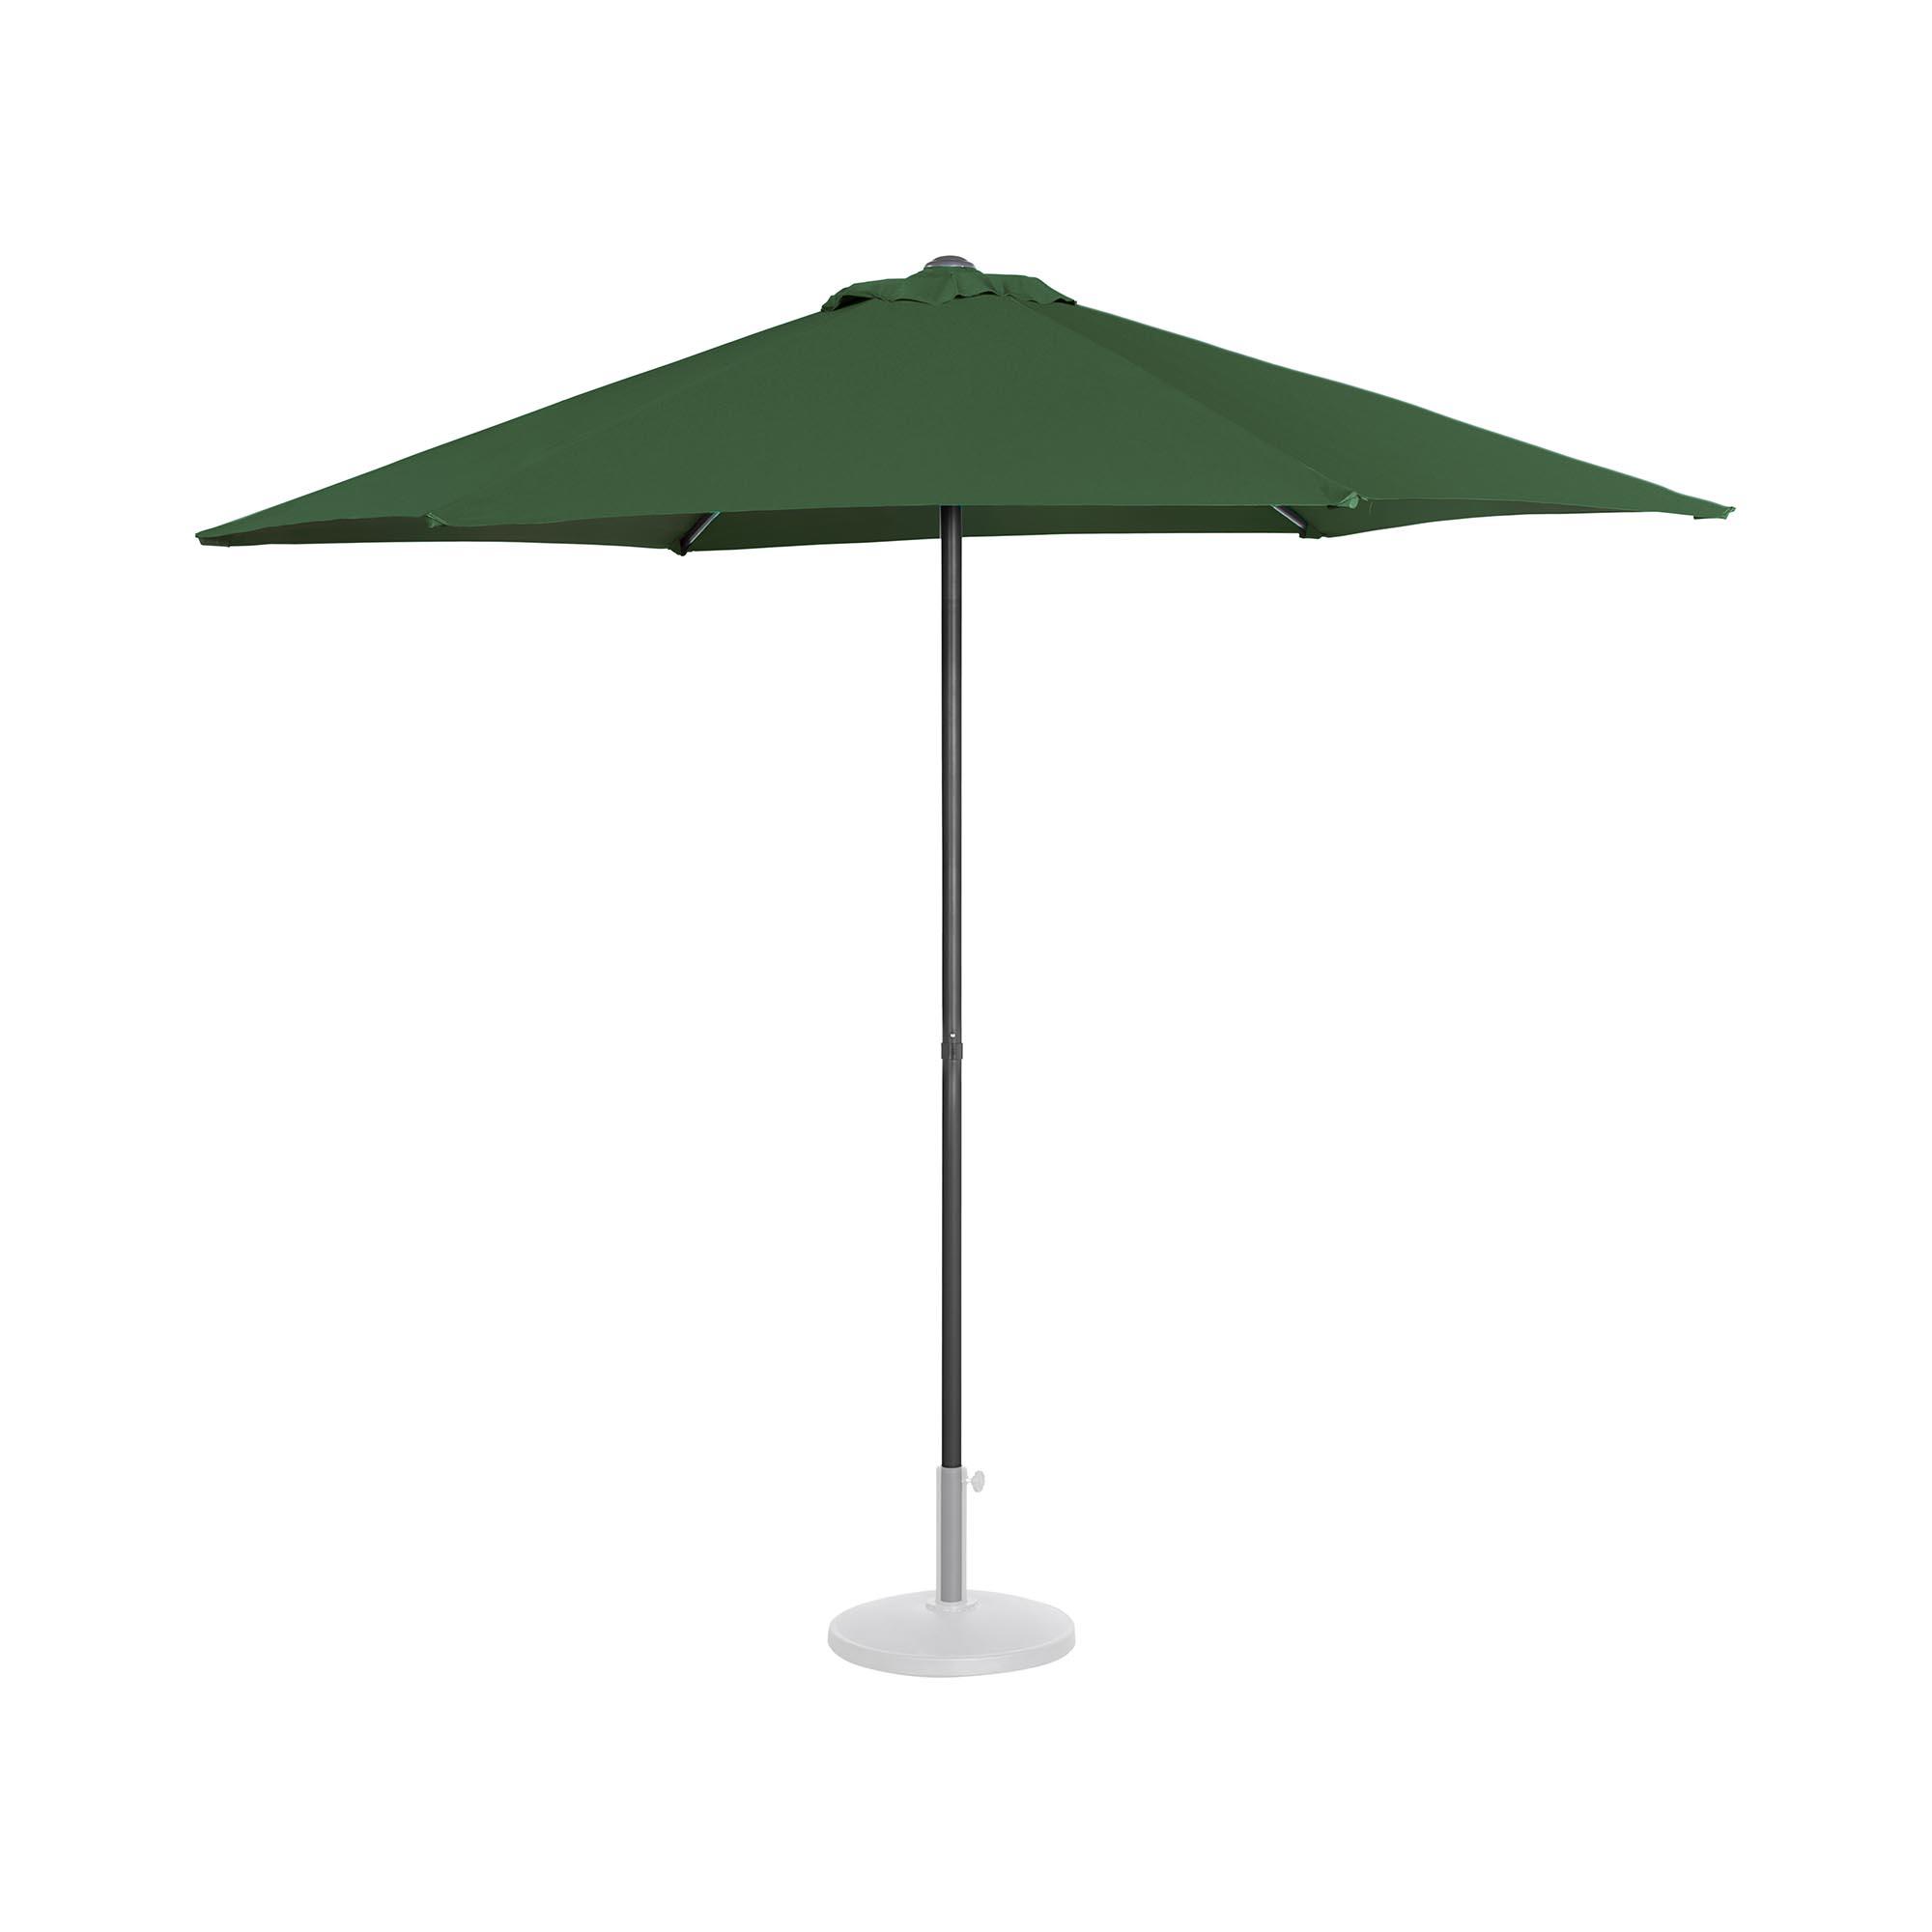 Uniprodo Sonnenschirm groß - grün - sechseckig - Ø 270 cm UNI_UMBRELLA_MR270GR